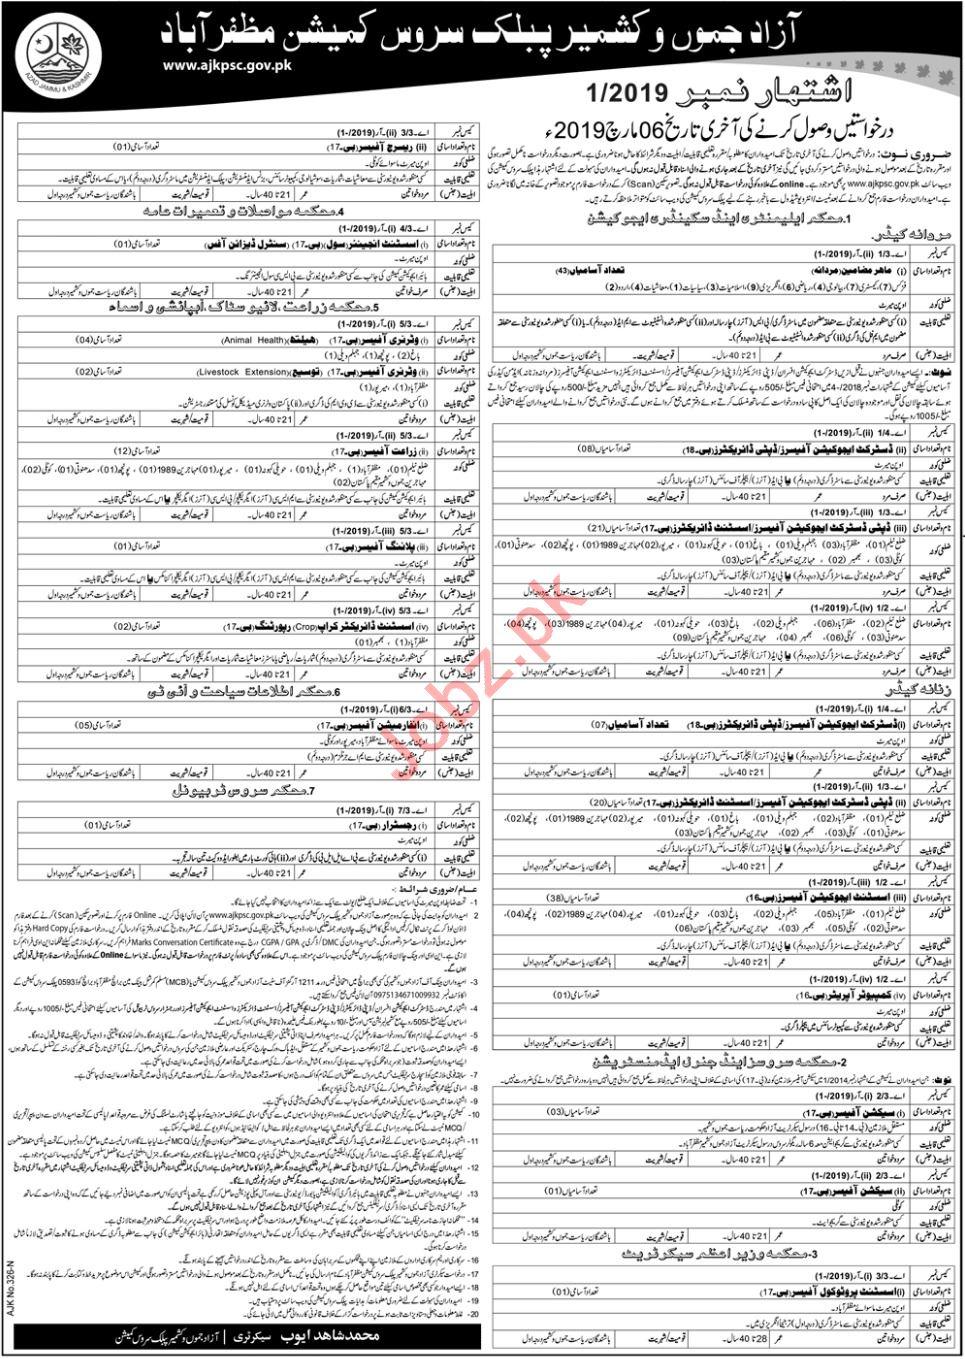 AJKPSC Public Service Commission Muzaffarabad Jobs 2019